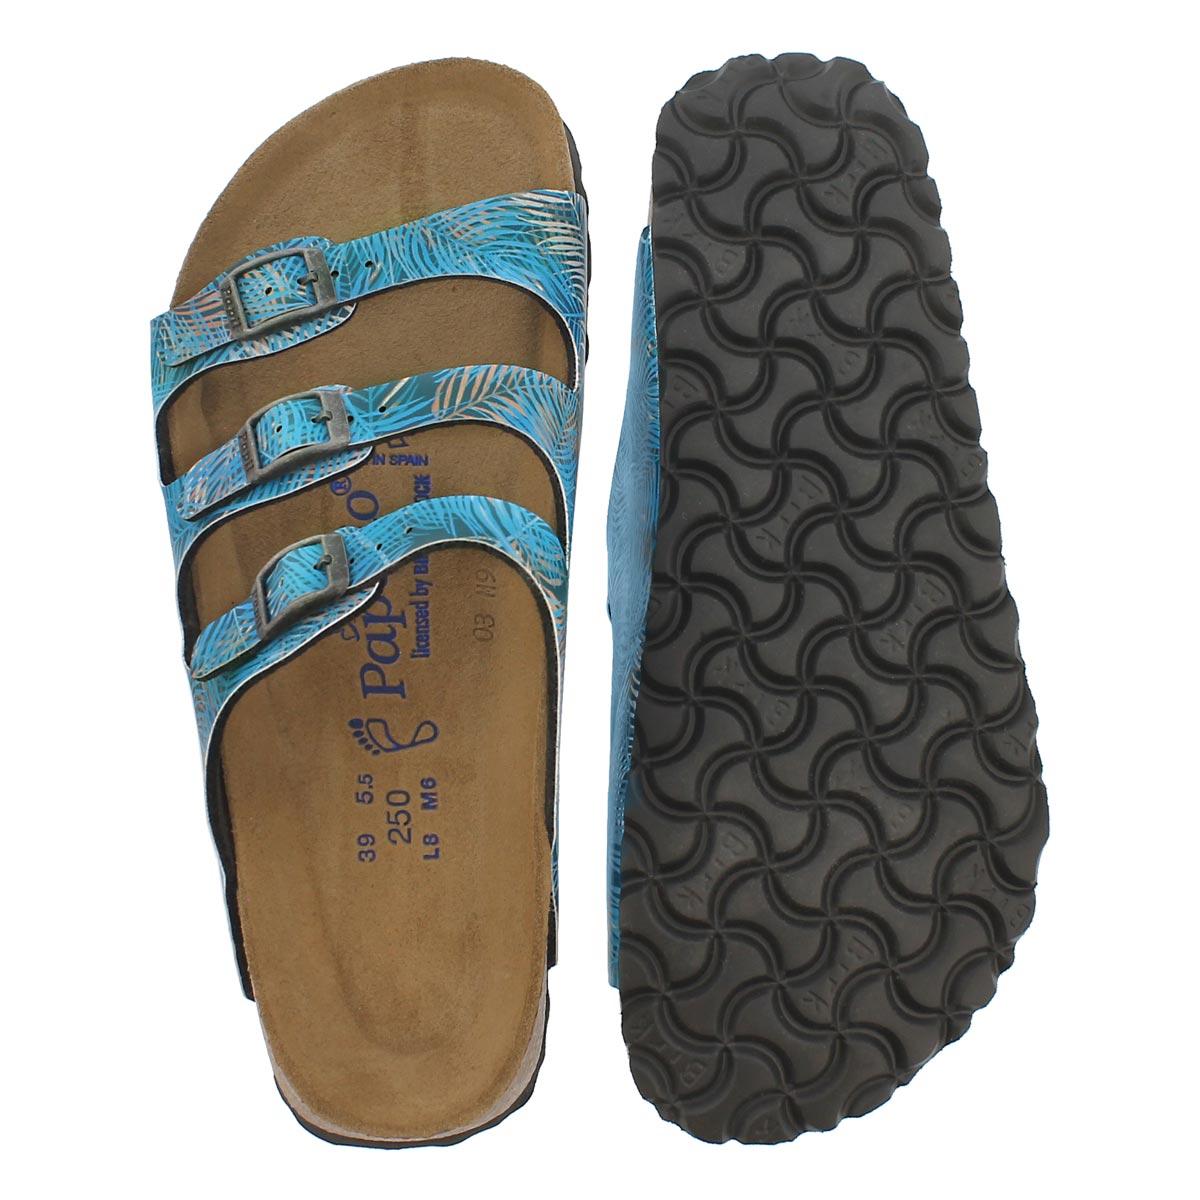 Lds Florida SF tropical leaf sandal